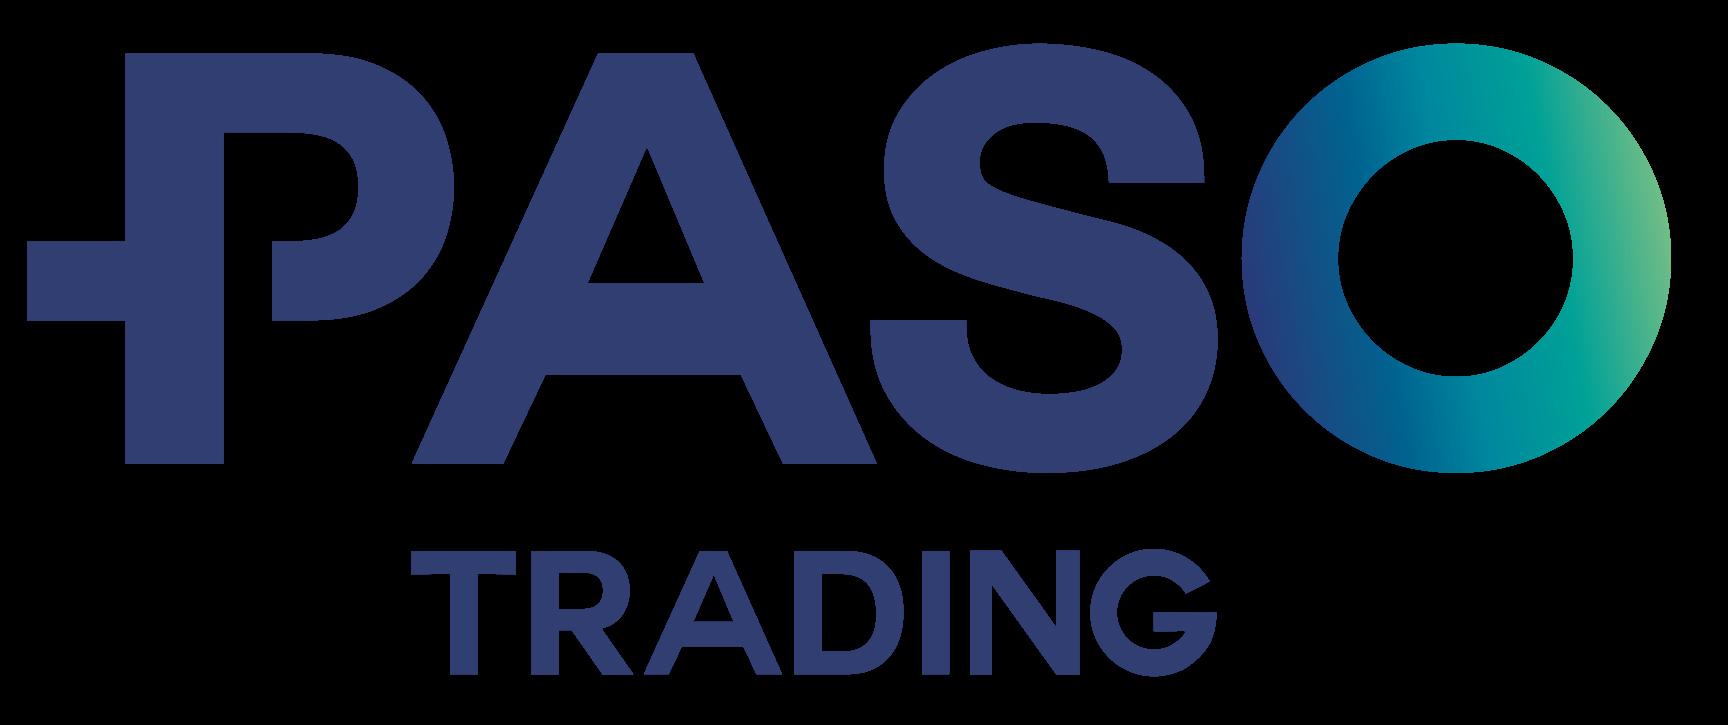 Paso-trading logo